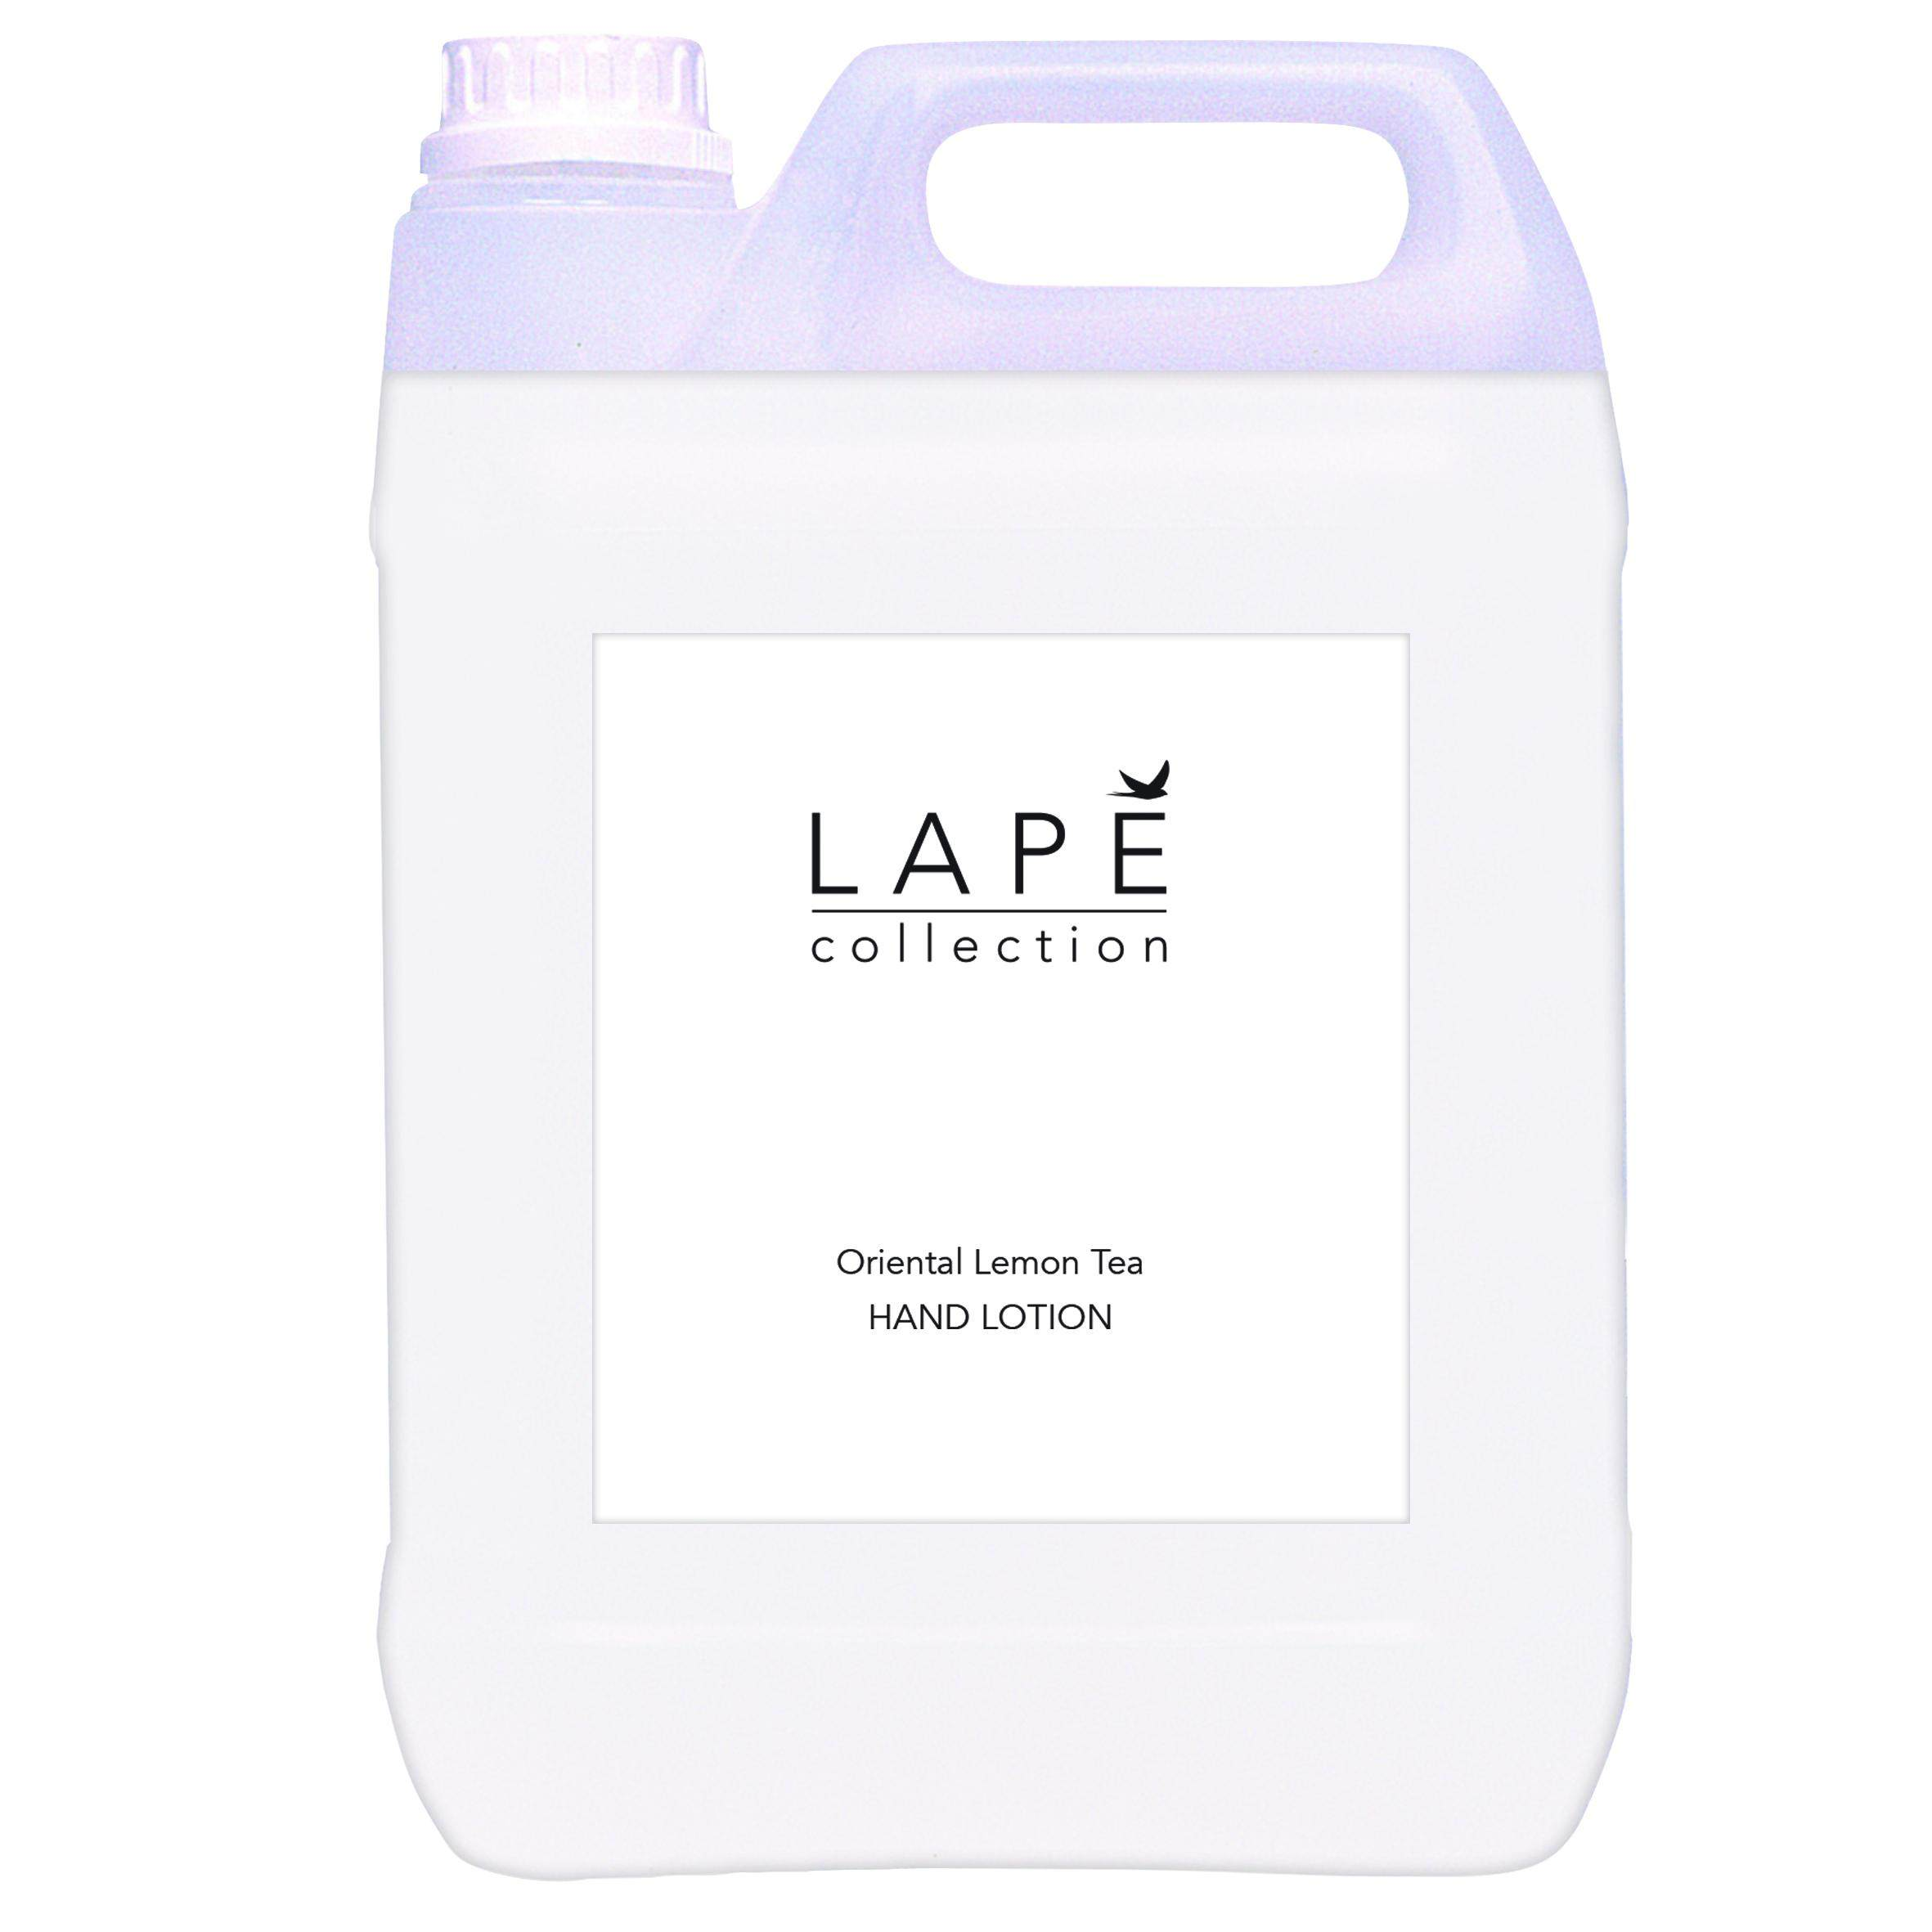 100934576--LAPE-Collection-Oriental-Lemon-Tea-Hand-Lotion-2x5L-refill.jpg